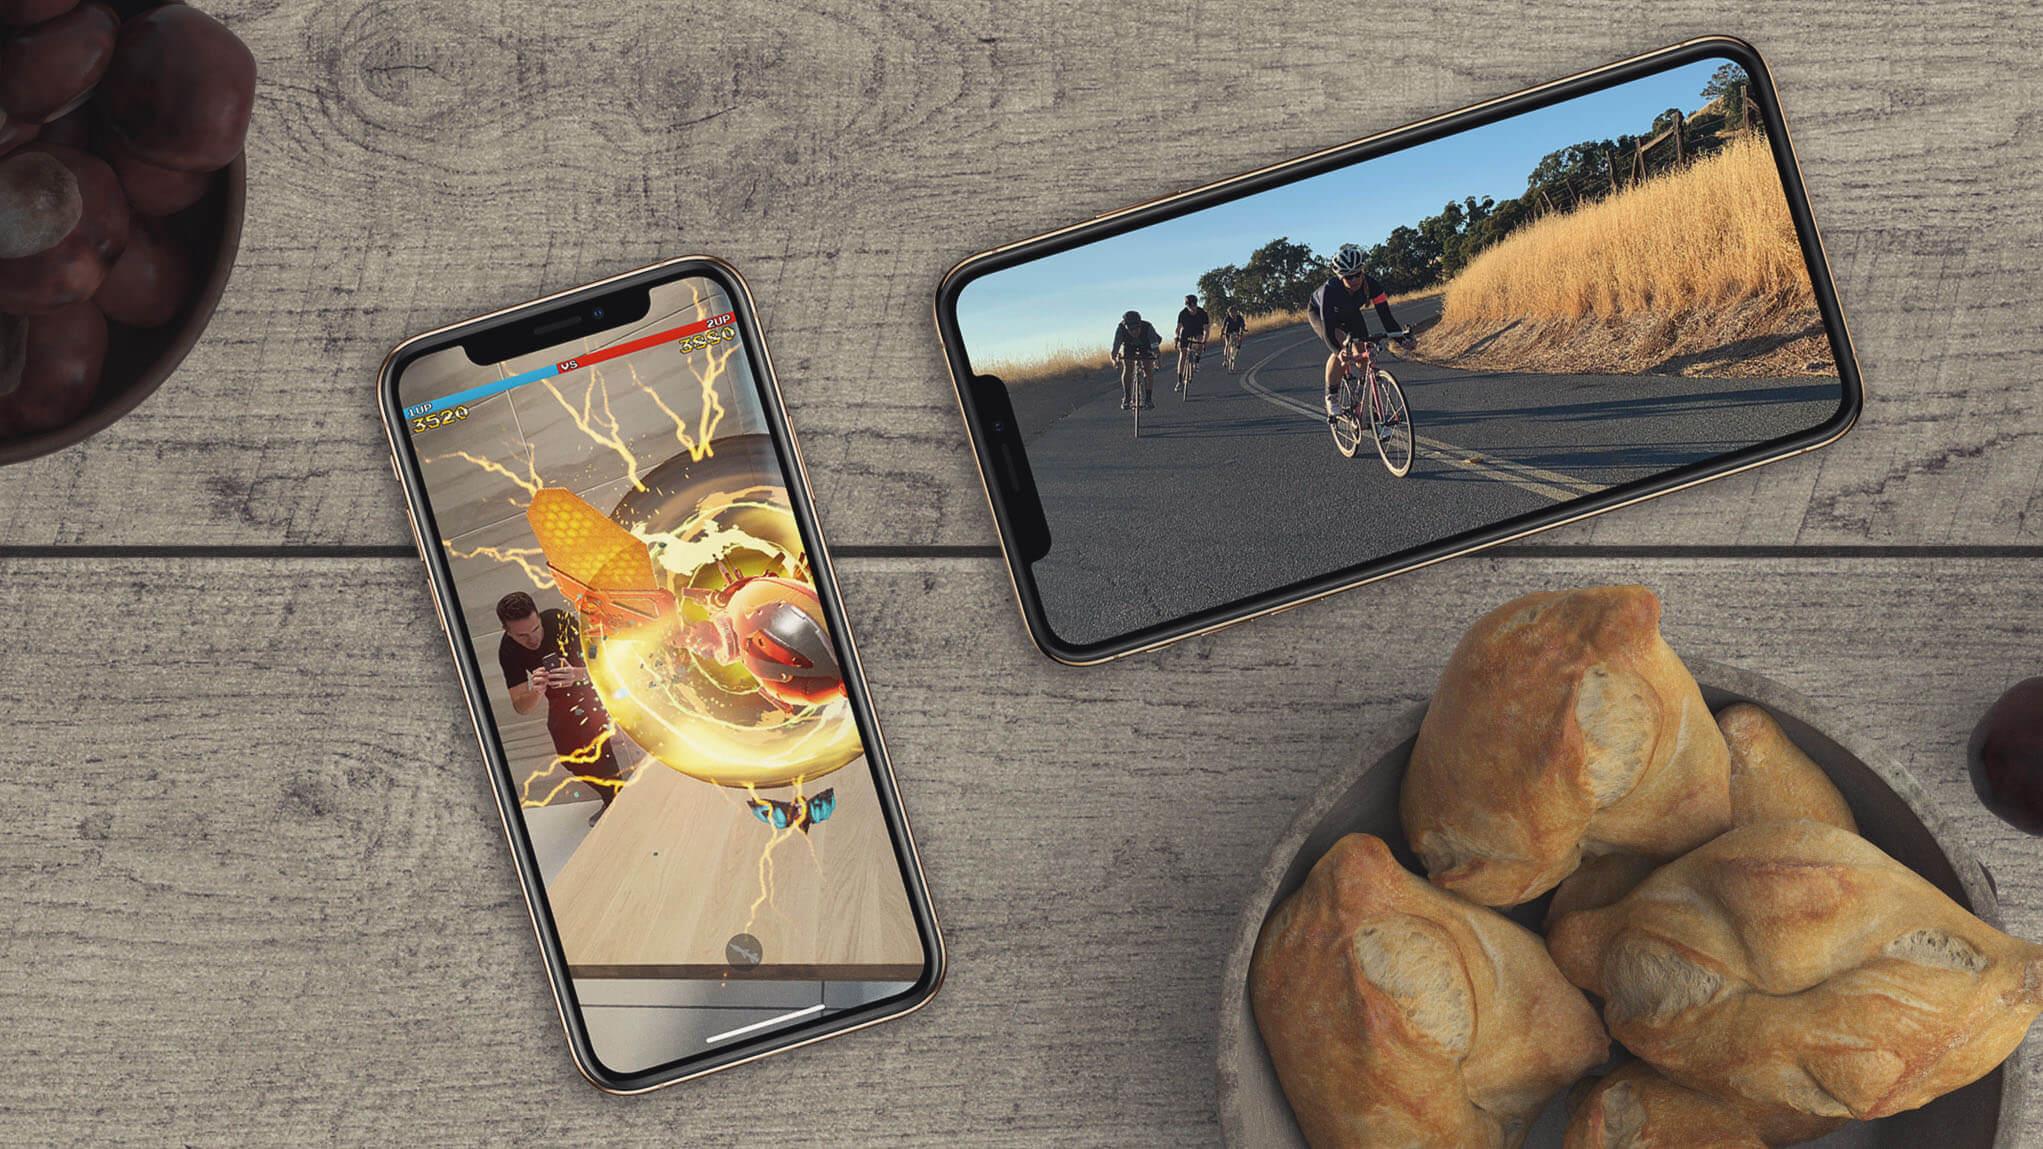 iOS 12 может ухудшать цветопередачу дисплеев iPhone X, XS и XS Max. Как исправить